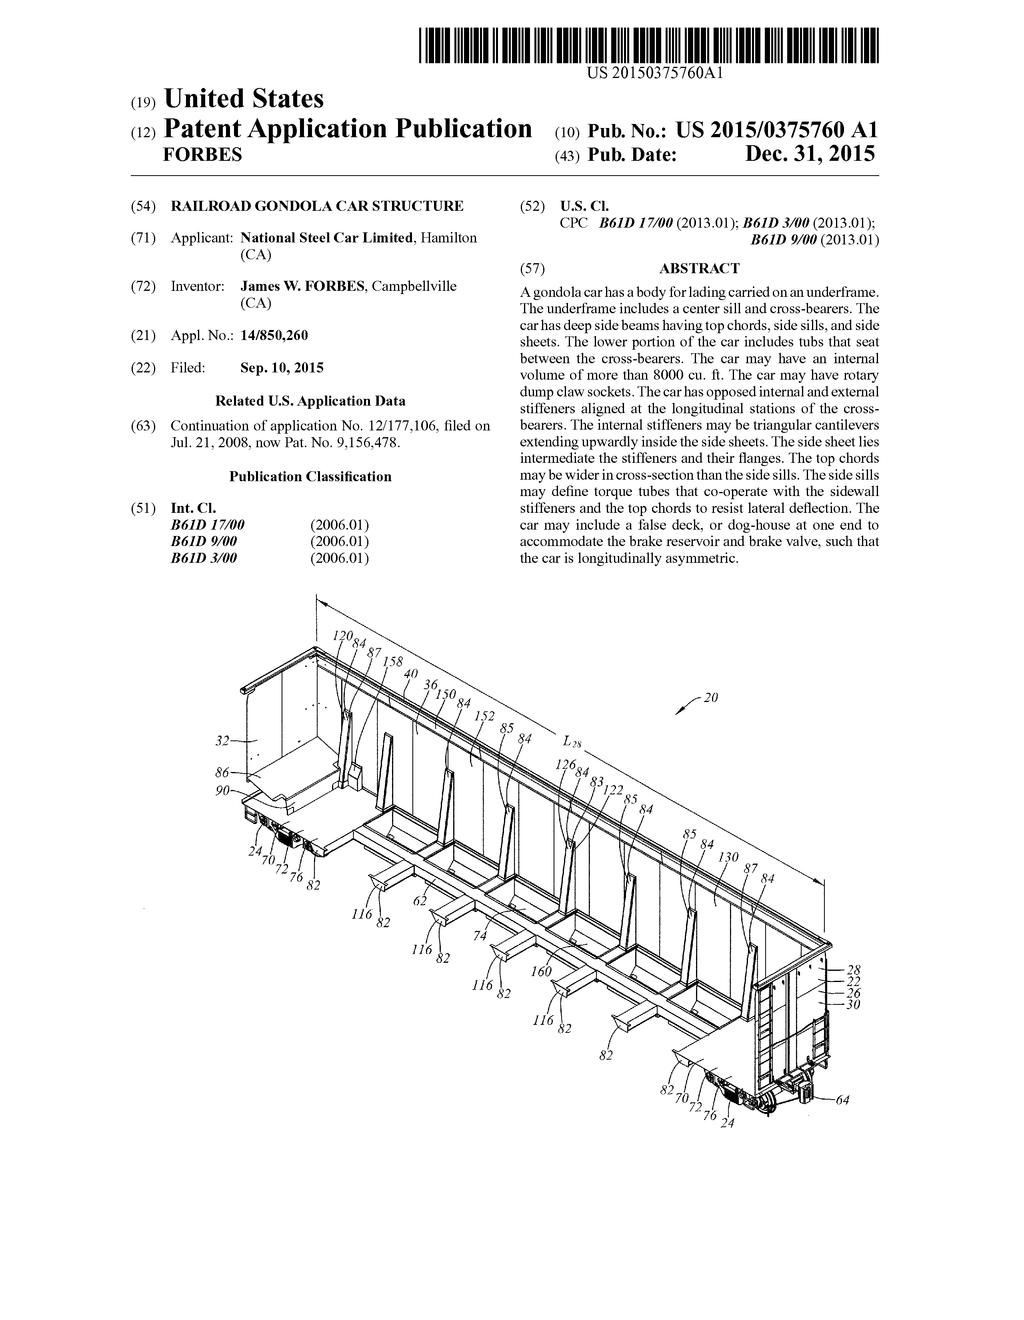 railroad gondola car structure diagram schematic and image 01 rh patentsencyclopedia com